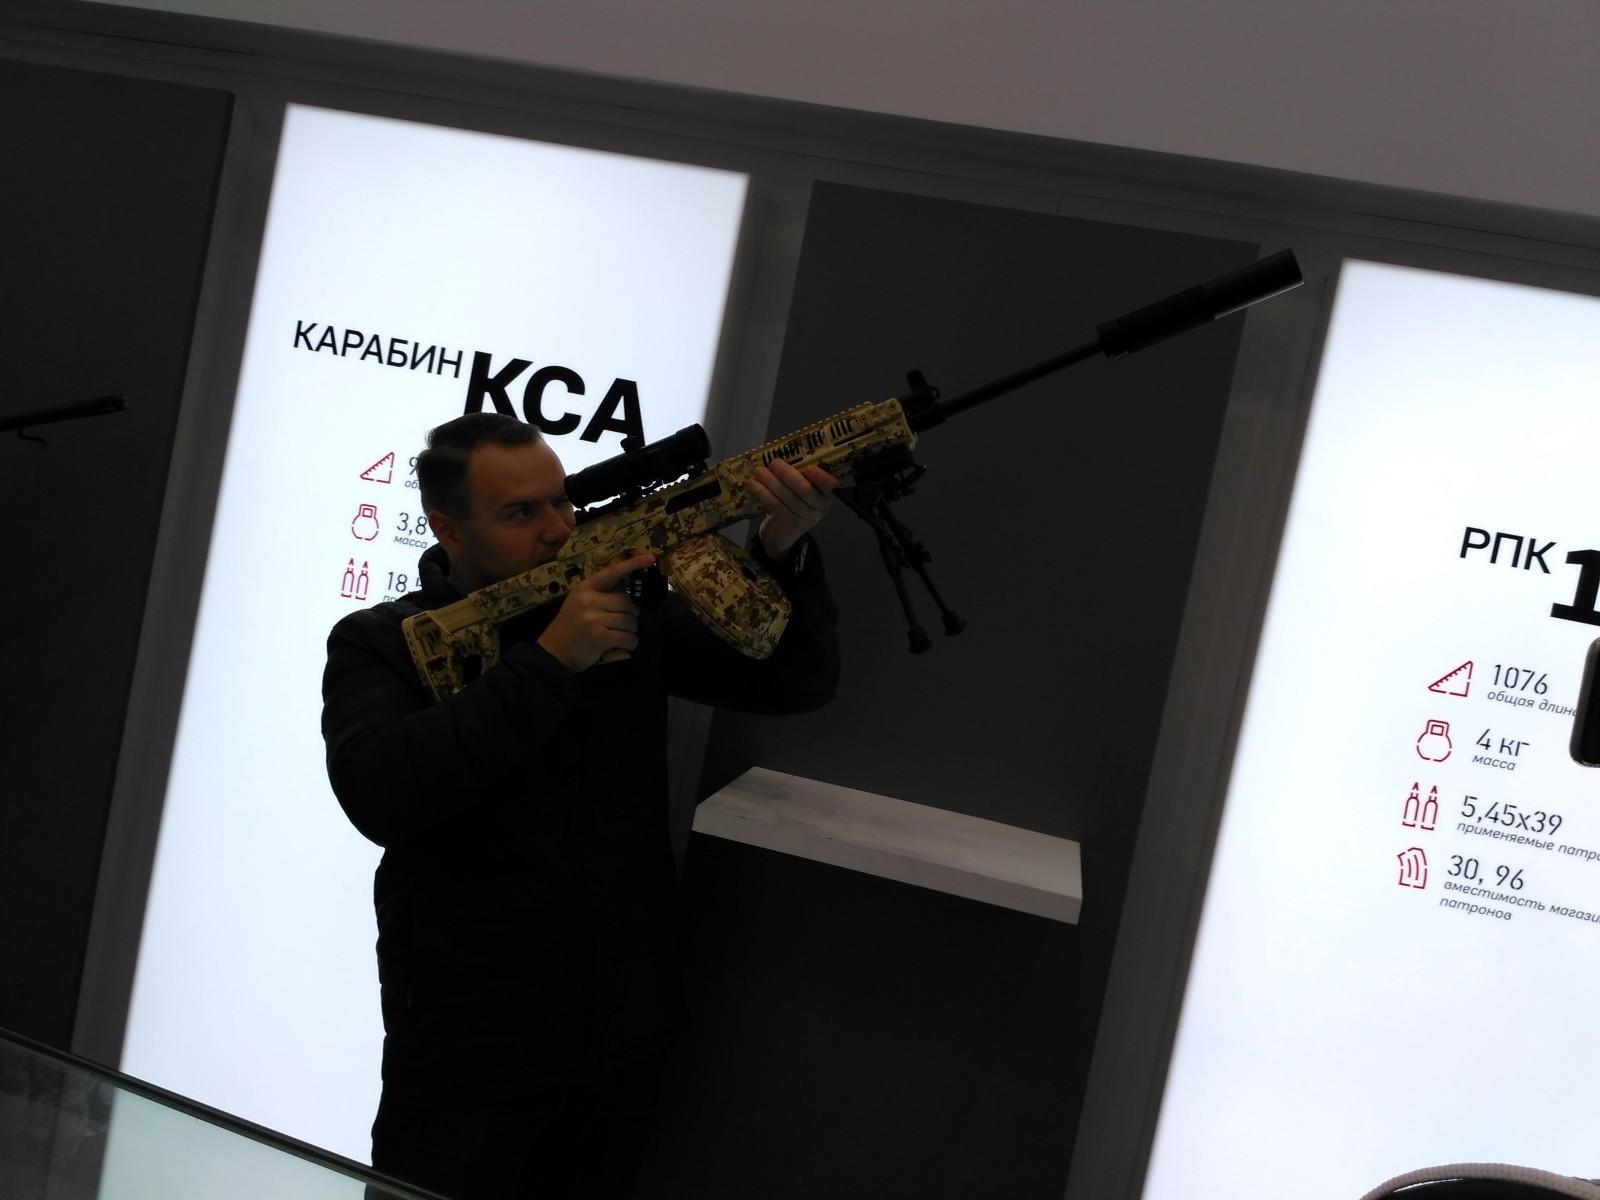 Ручной пулемет РПК-16 под патрон 5,45х39 от концерна «Калашников»